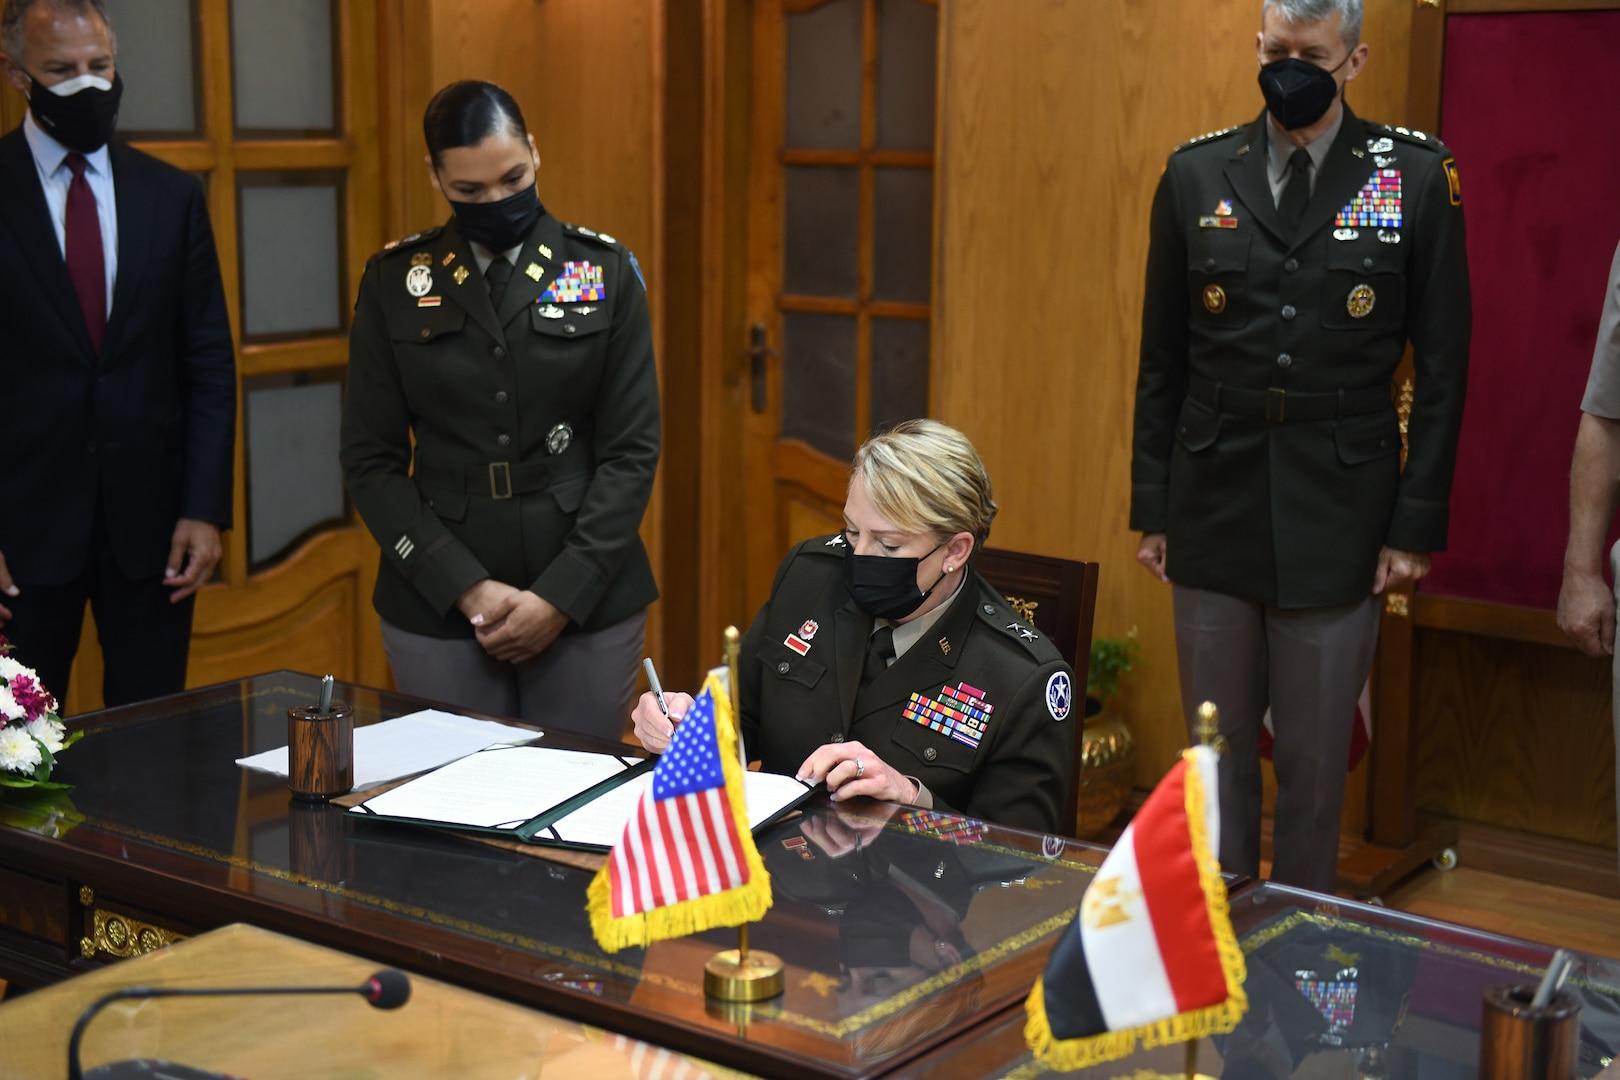 Army Maj. Gen. Tracy Norris, adjutant general, Texas National Guard, signs a document formalizing the pairing of Egypt and the Texas National Guard in the Department of Defense National Guard State Partnership Program, Cairo, Egypt, June 14, 2021.